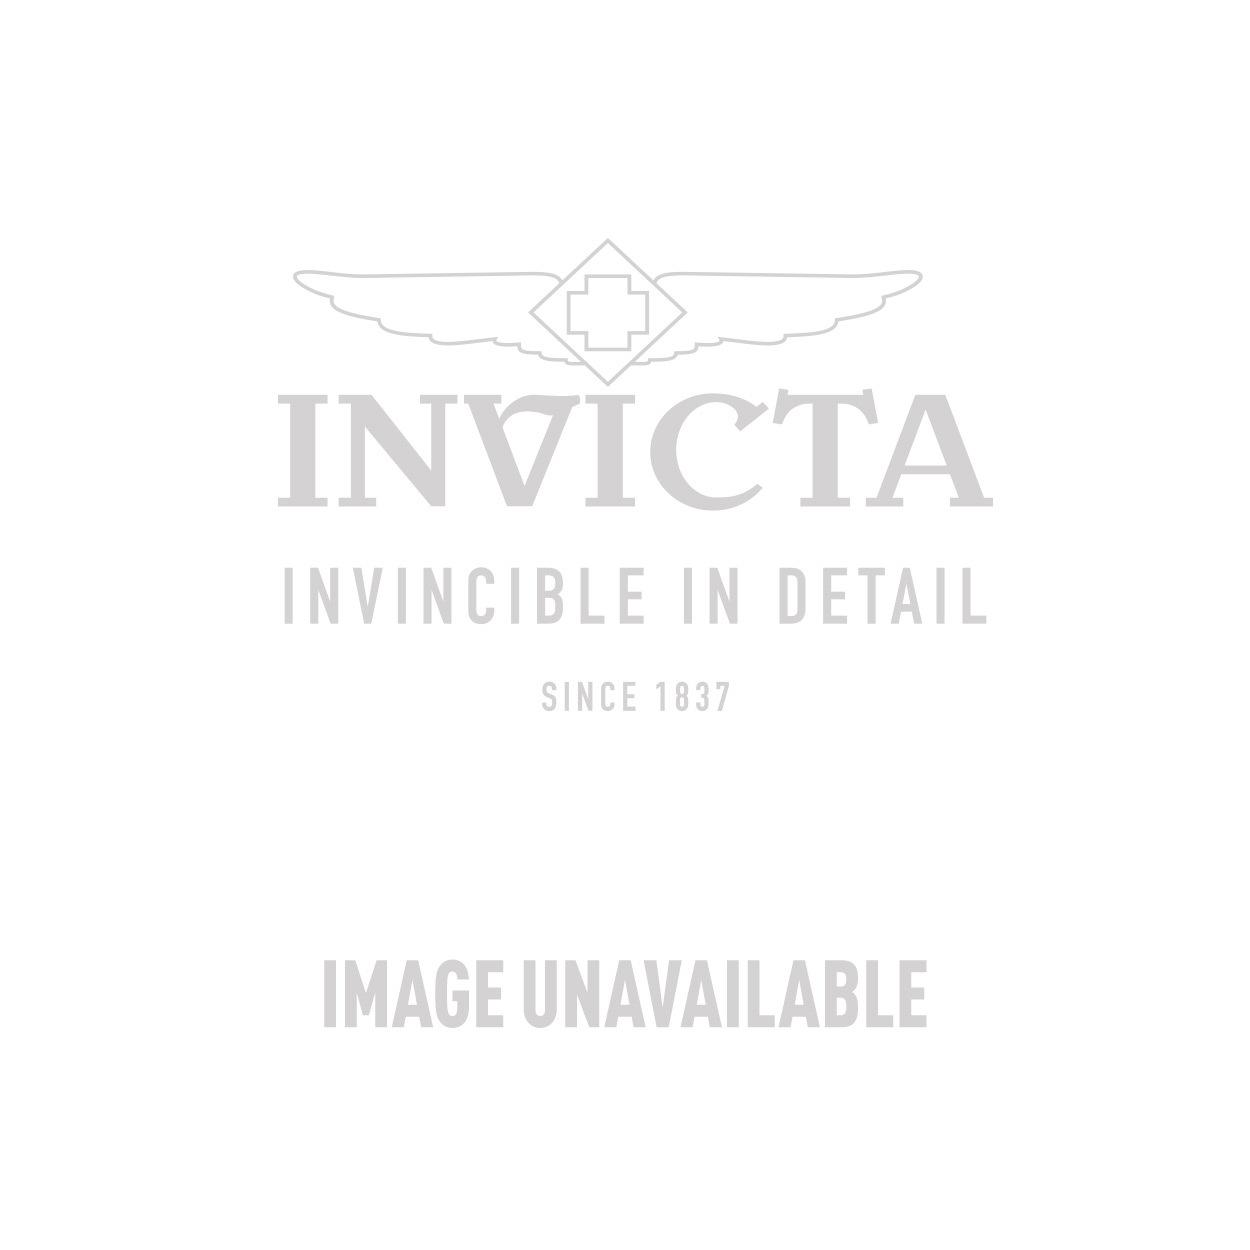 Invicta DNA Mens Quartz 46mm Stainless Steel Case Grey, Black, Red Dial - Model 25056